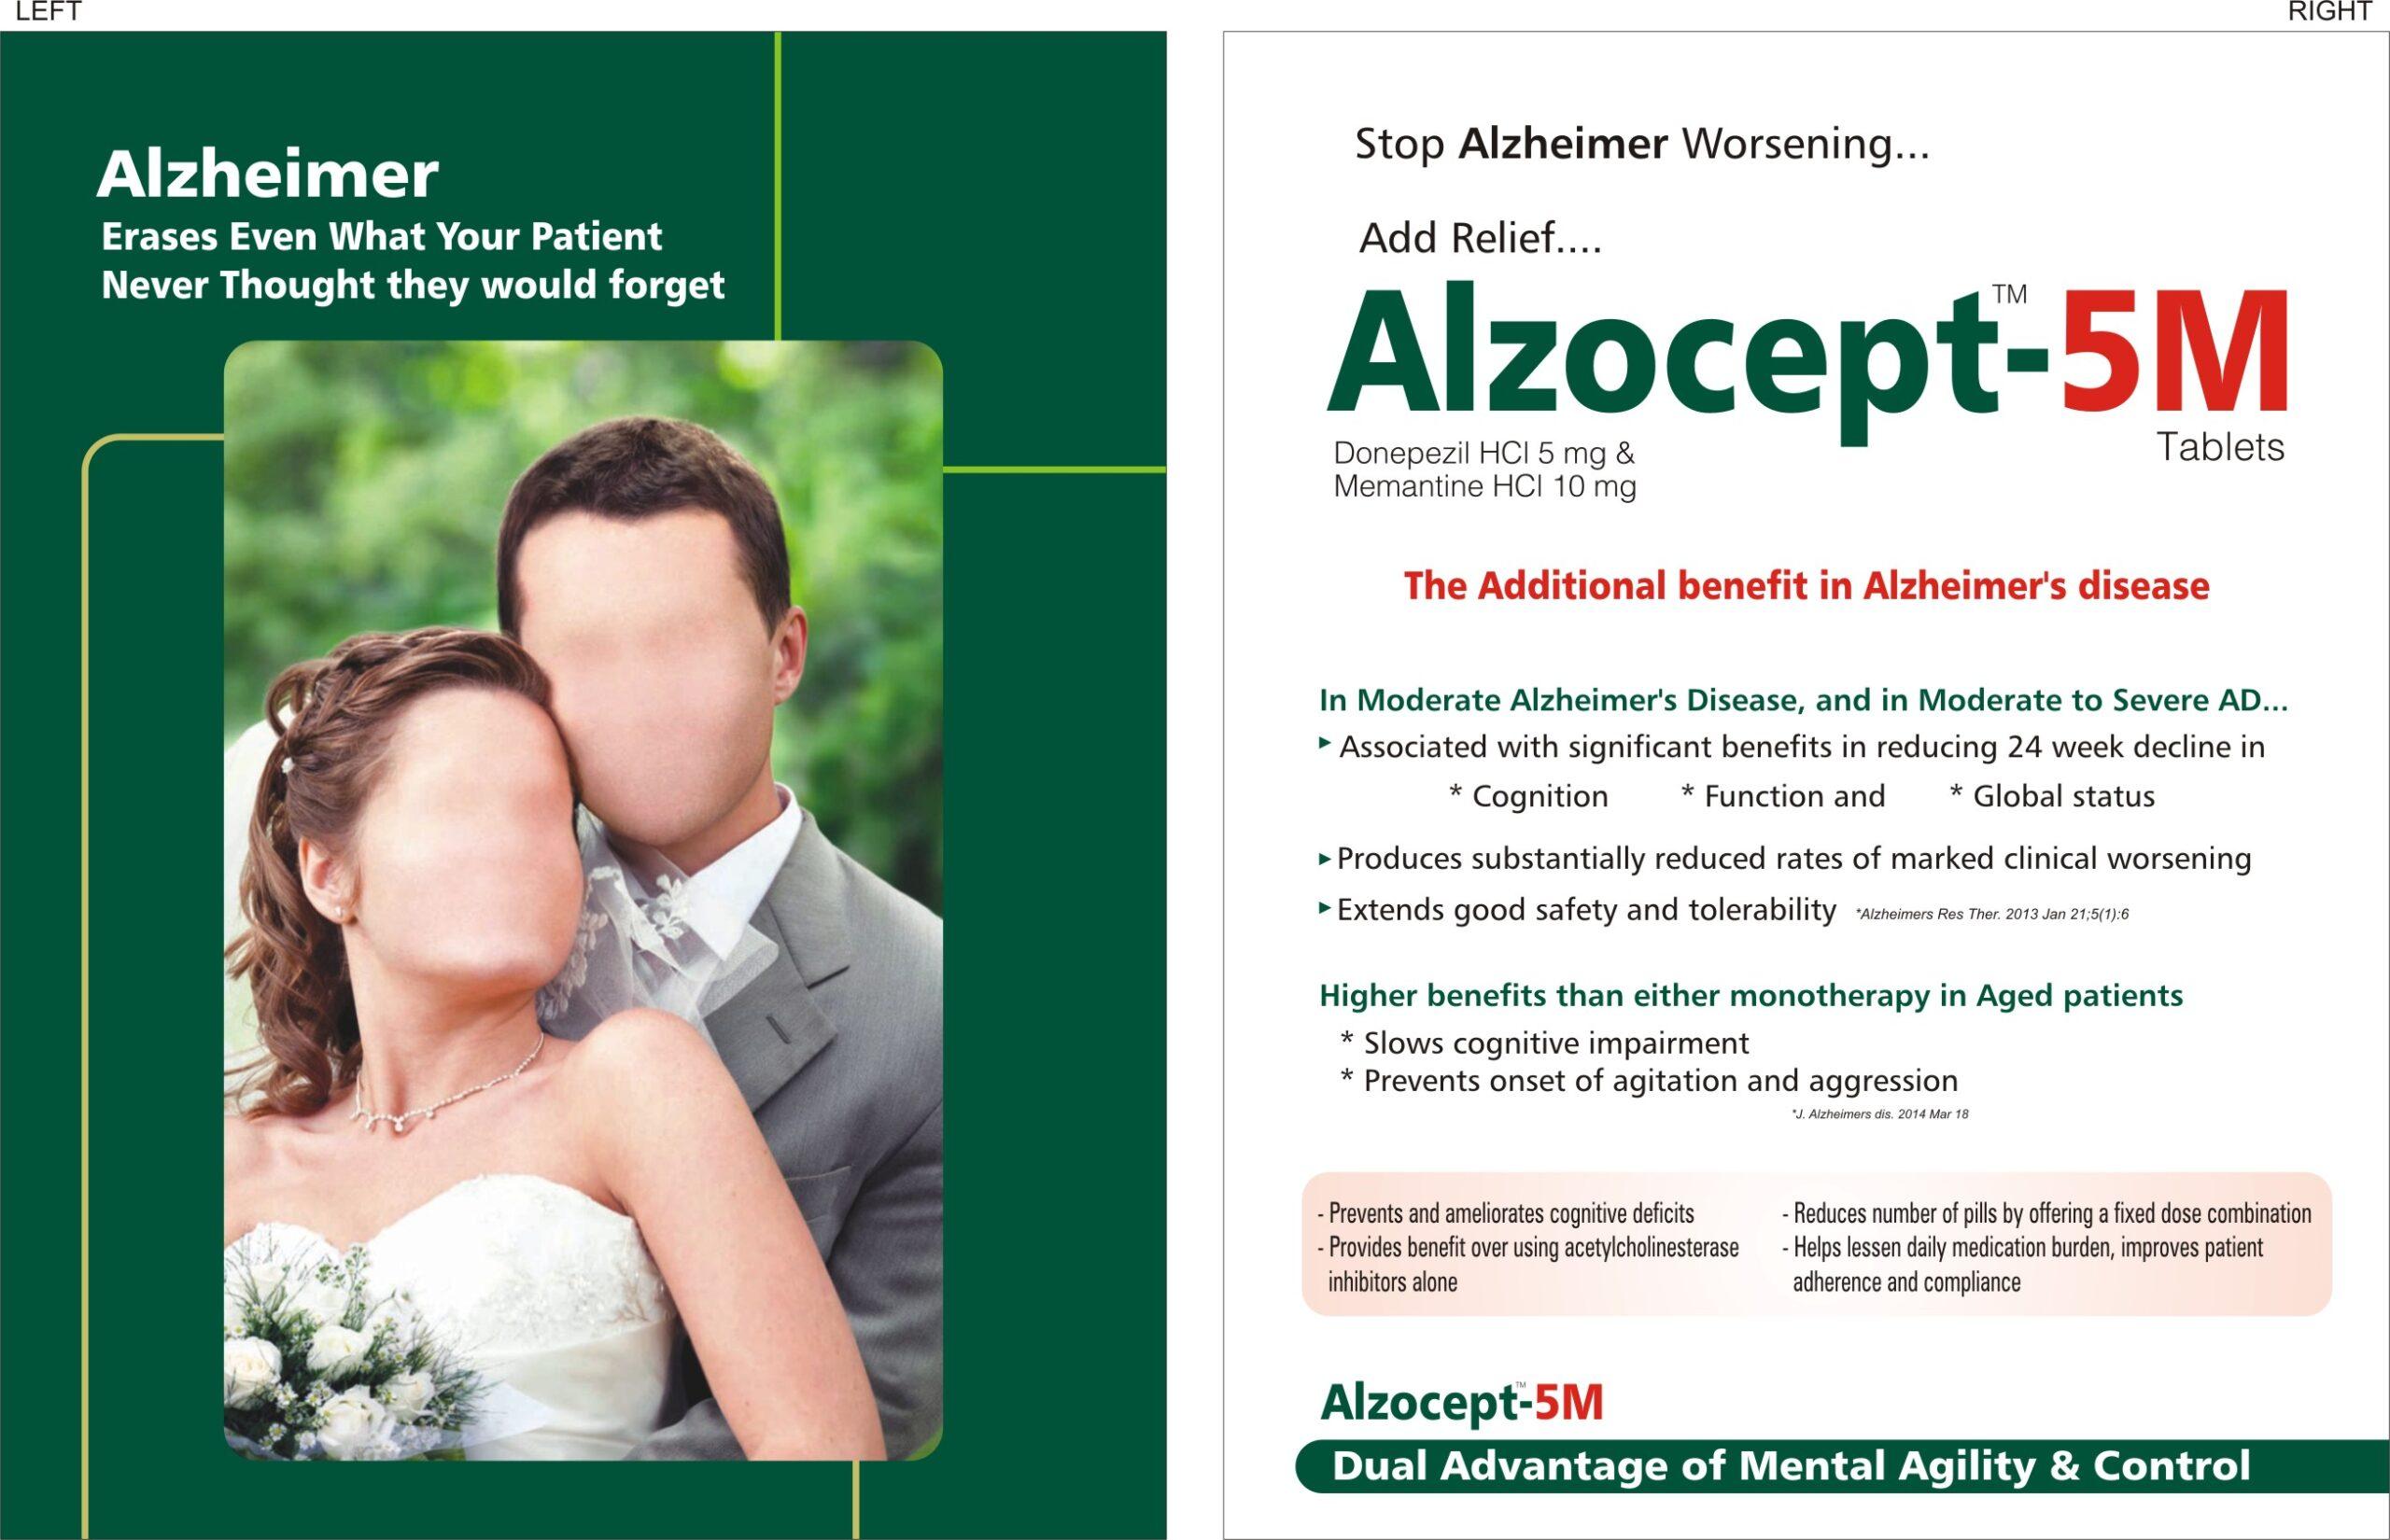 Alzocept 5 M